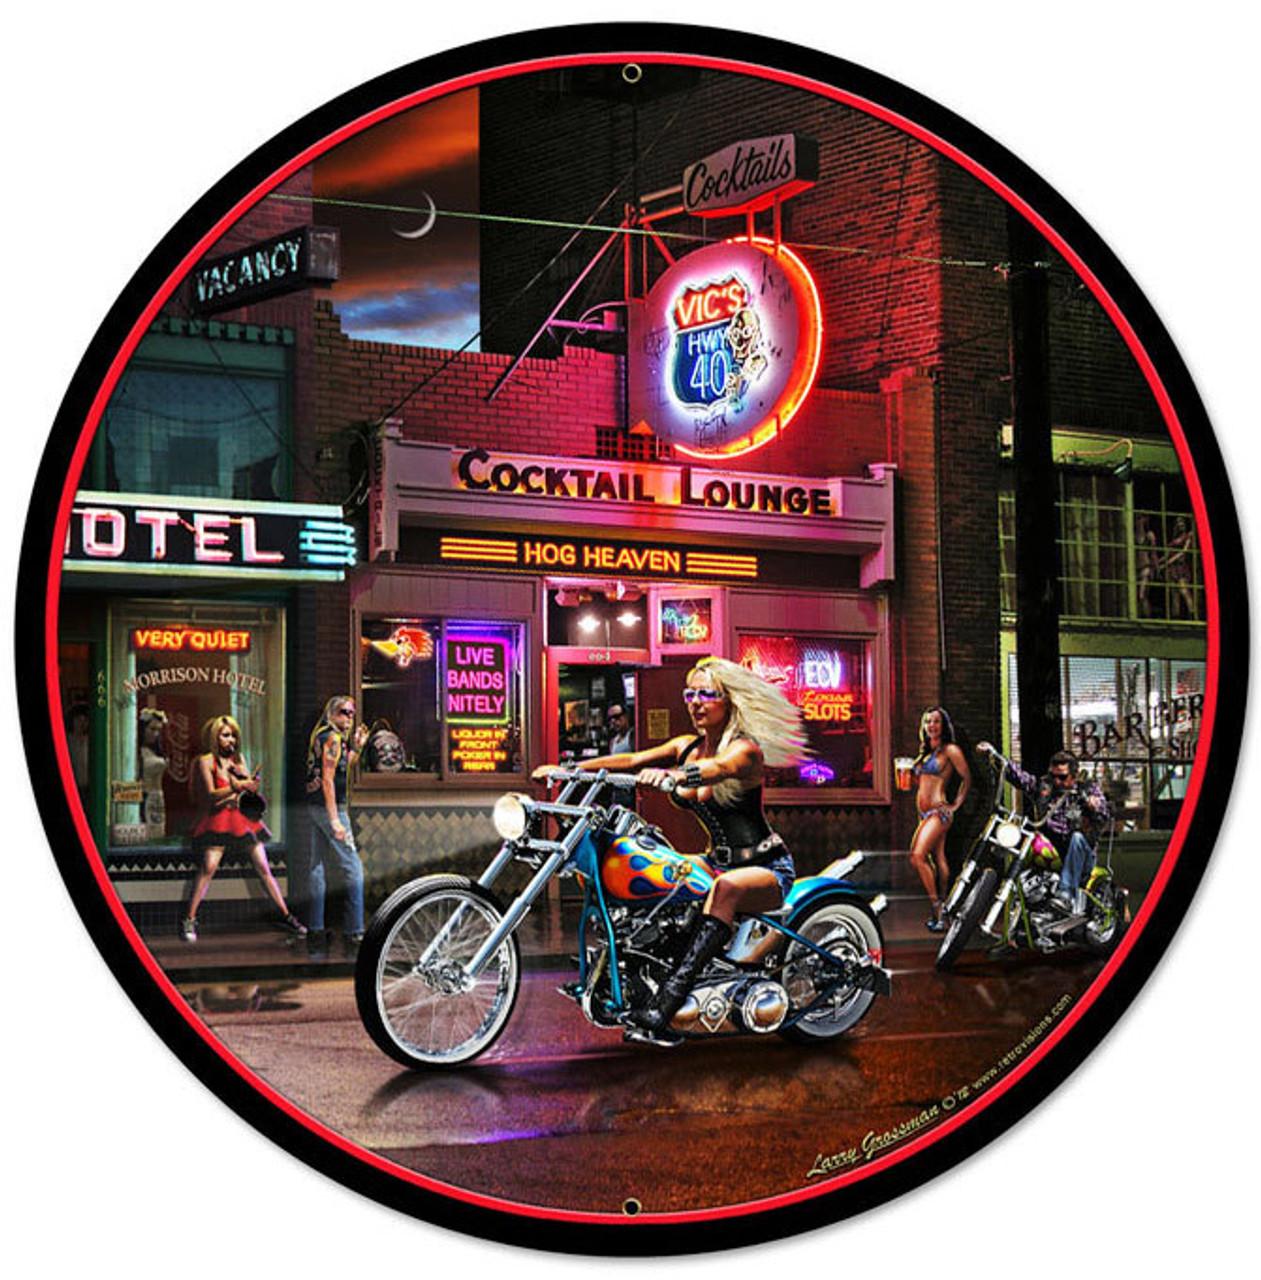 Retro Biker Bar Round Metal Sign 28 x 28 Inches